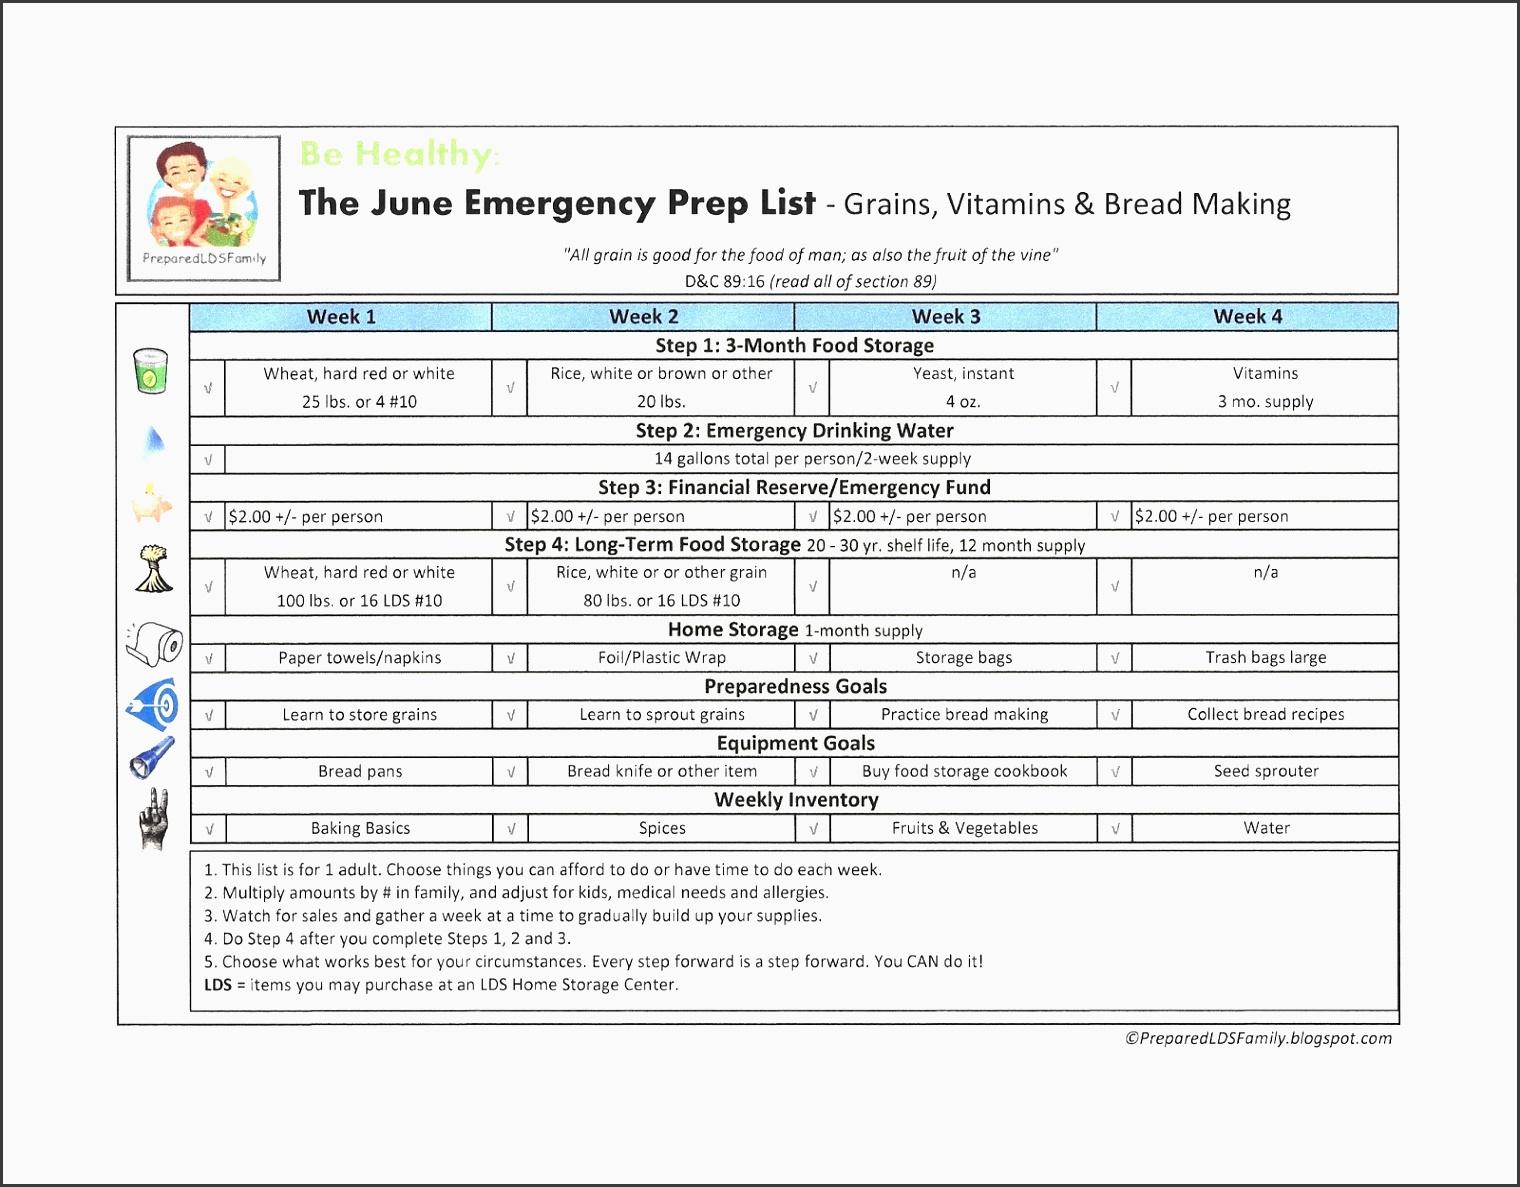 prepared lds family june emergency preparedness goals grains vitamins and bread making